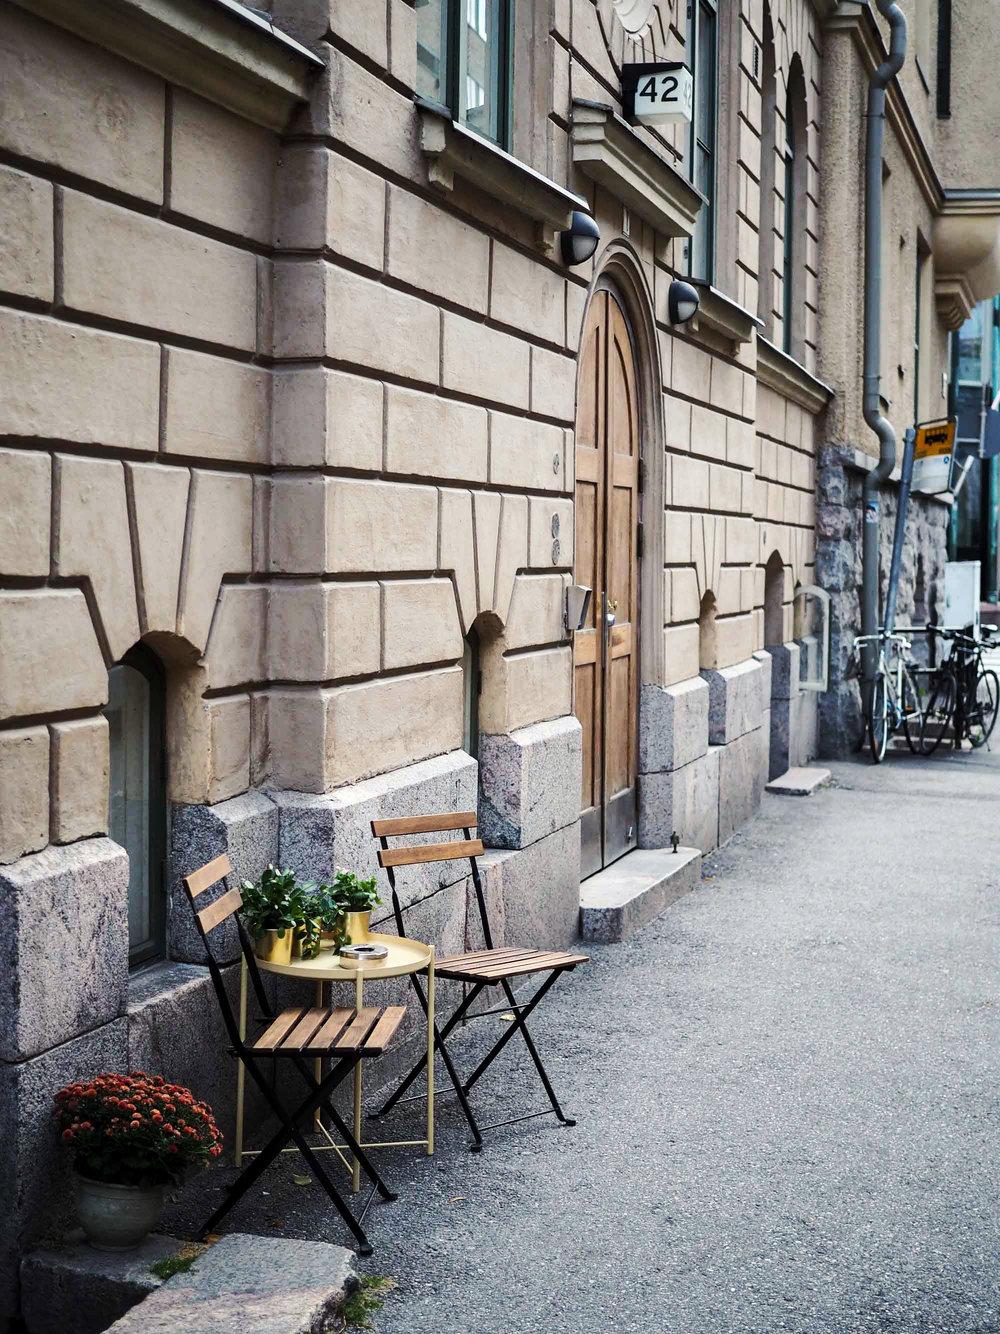 Tuolit odottamassa istujia, Helsinki syyskuu 2018.